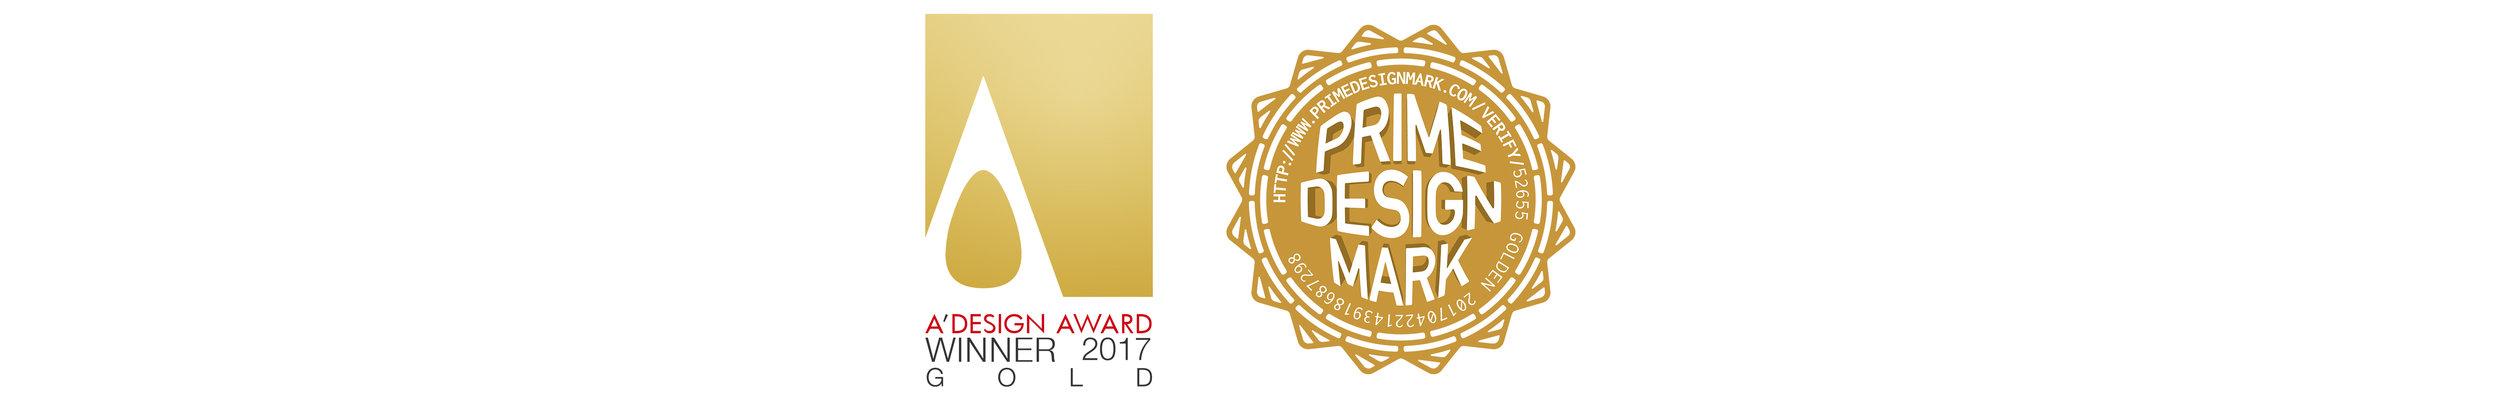 A'Design Awards2-Recoveredsdasss2webuzun copy.jpg